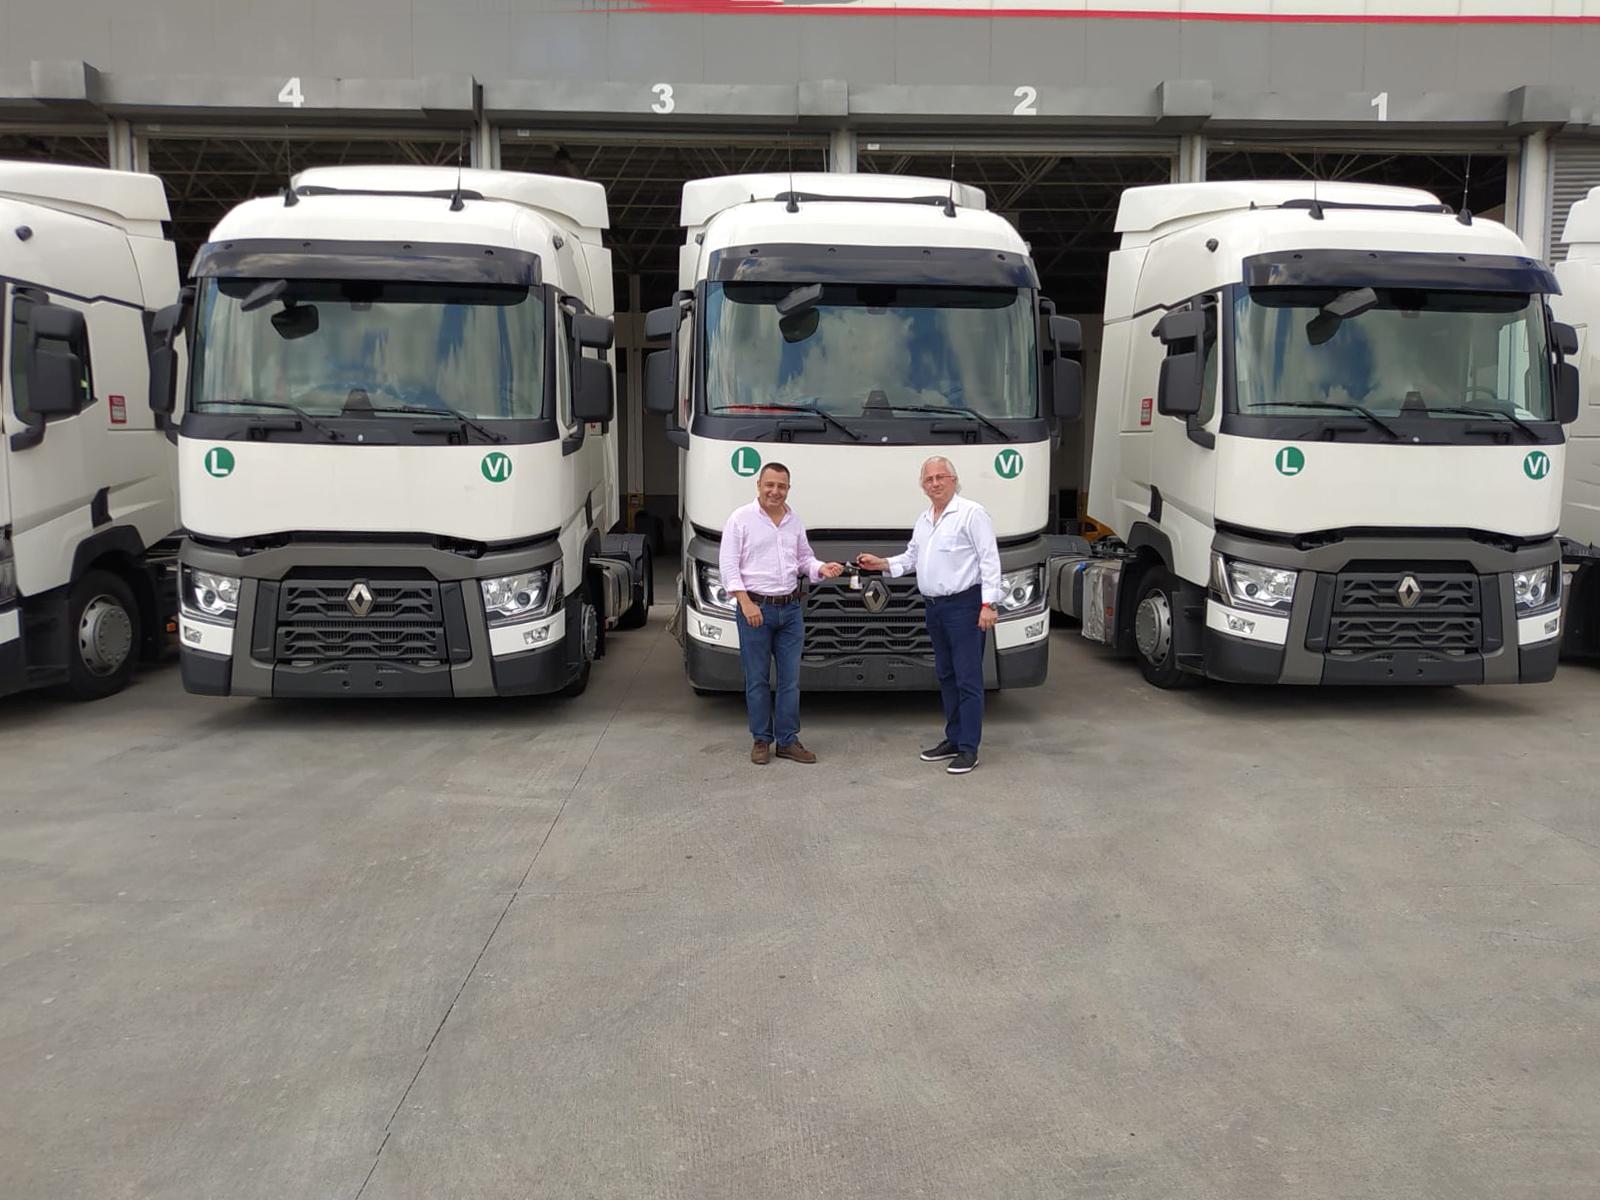 1595329667_renault_trucks_kare_karayolu_teslimat_gorsel_3.jpg